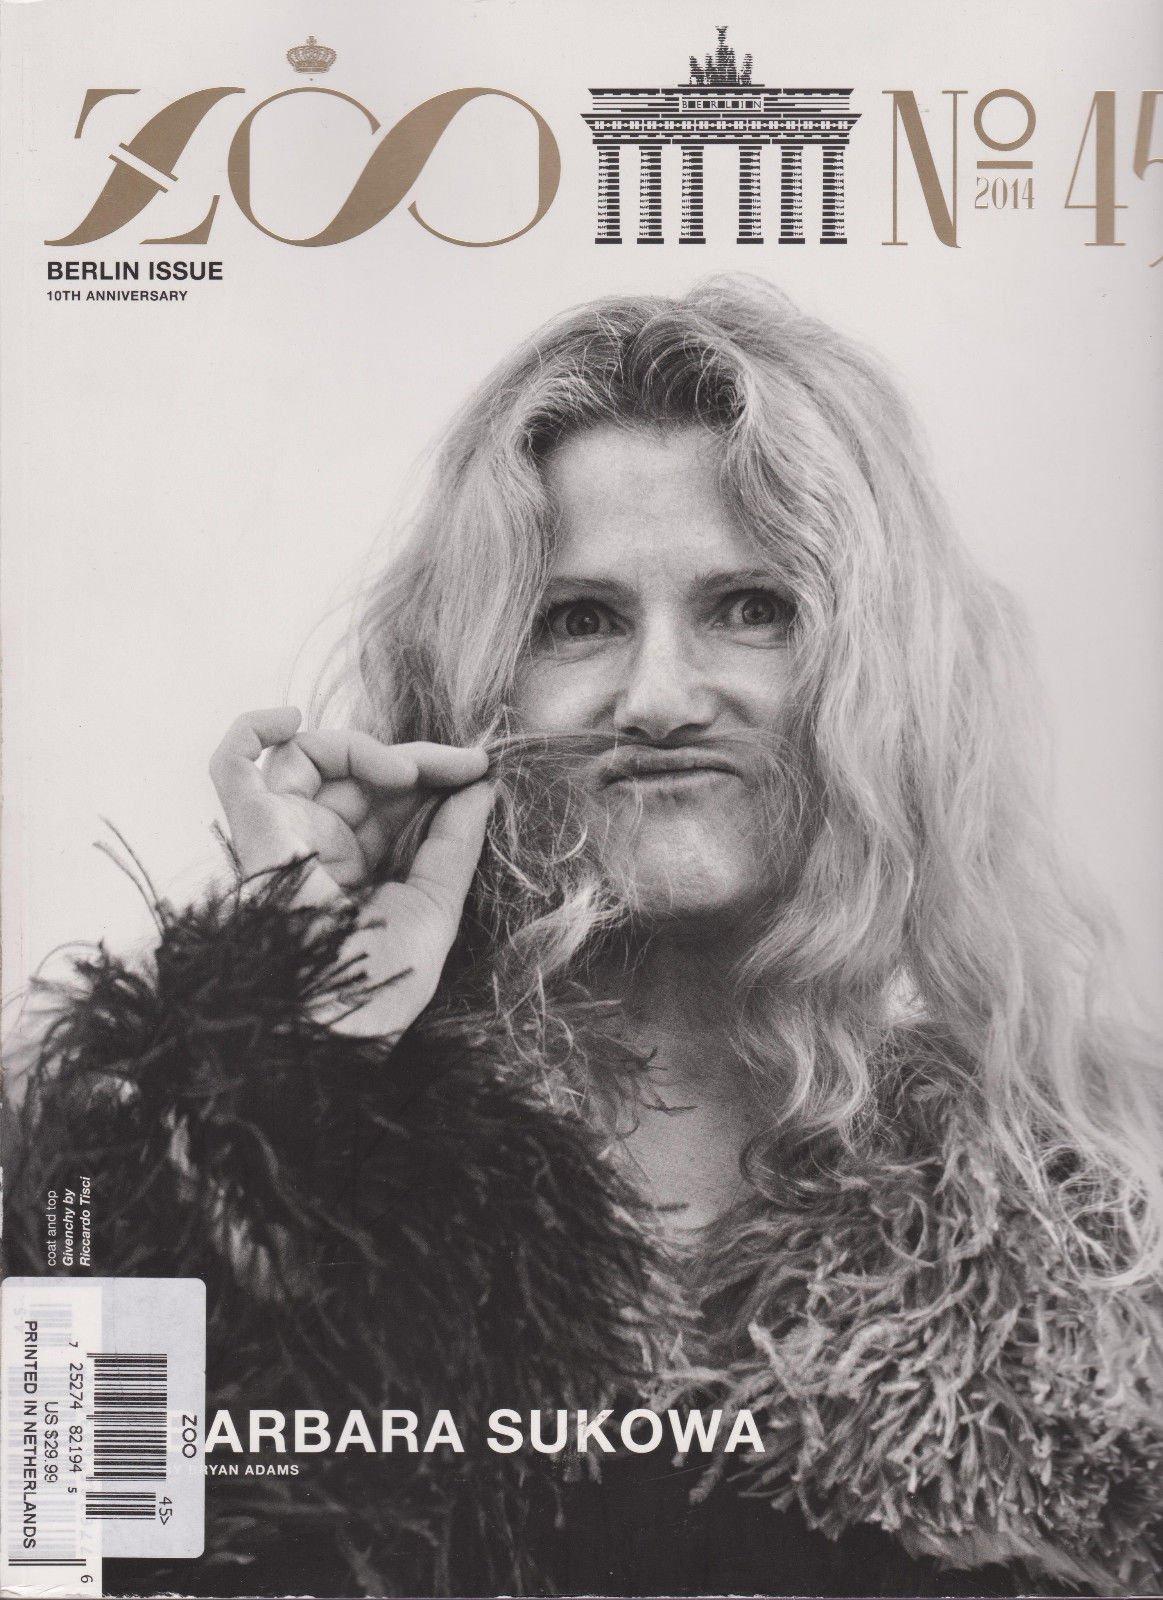 ZOO MAGAZINE #45 2014, BERLIN ISSUE 10th ANNIVERSARY, BARBARA SUKOWA, FASHION.